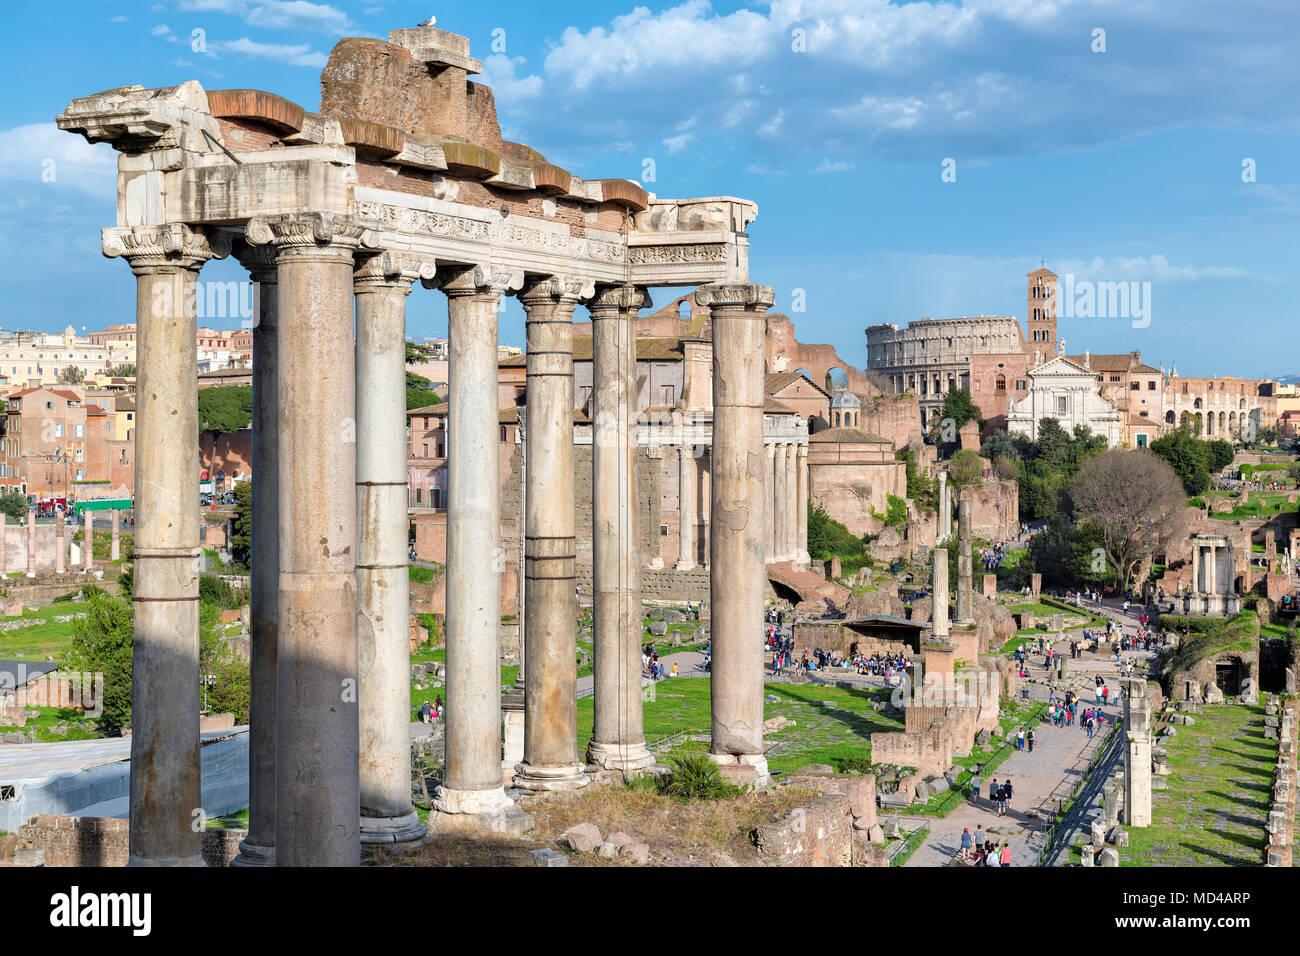 Foro Romano al atardecer en Roma, Italia. Imagen De Stock